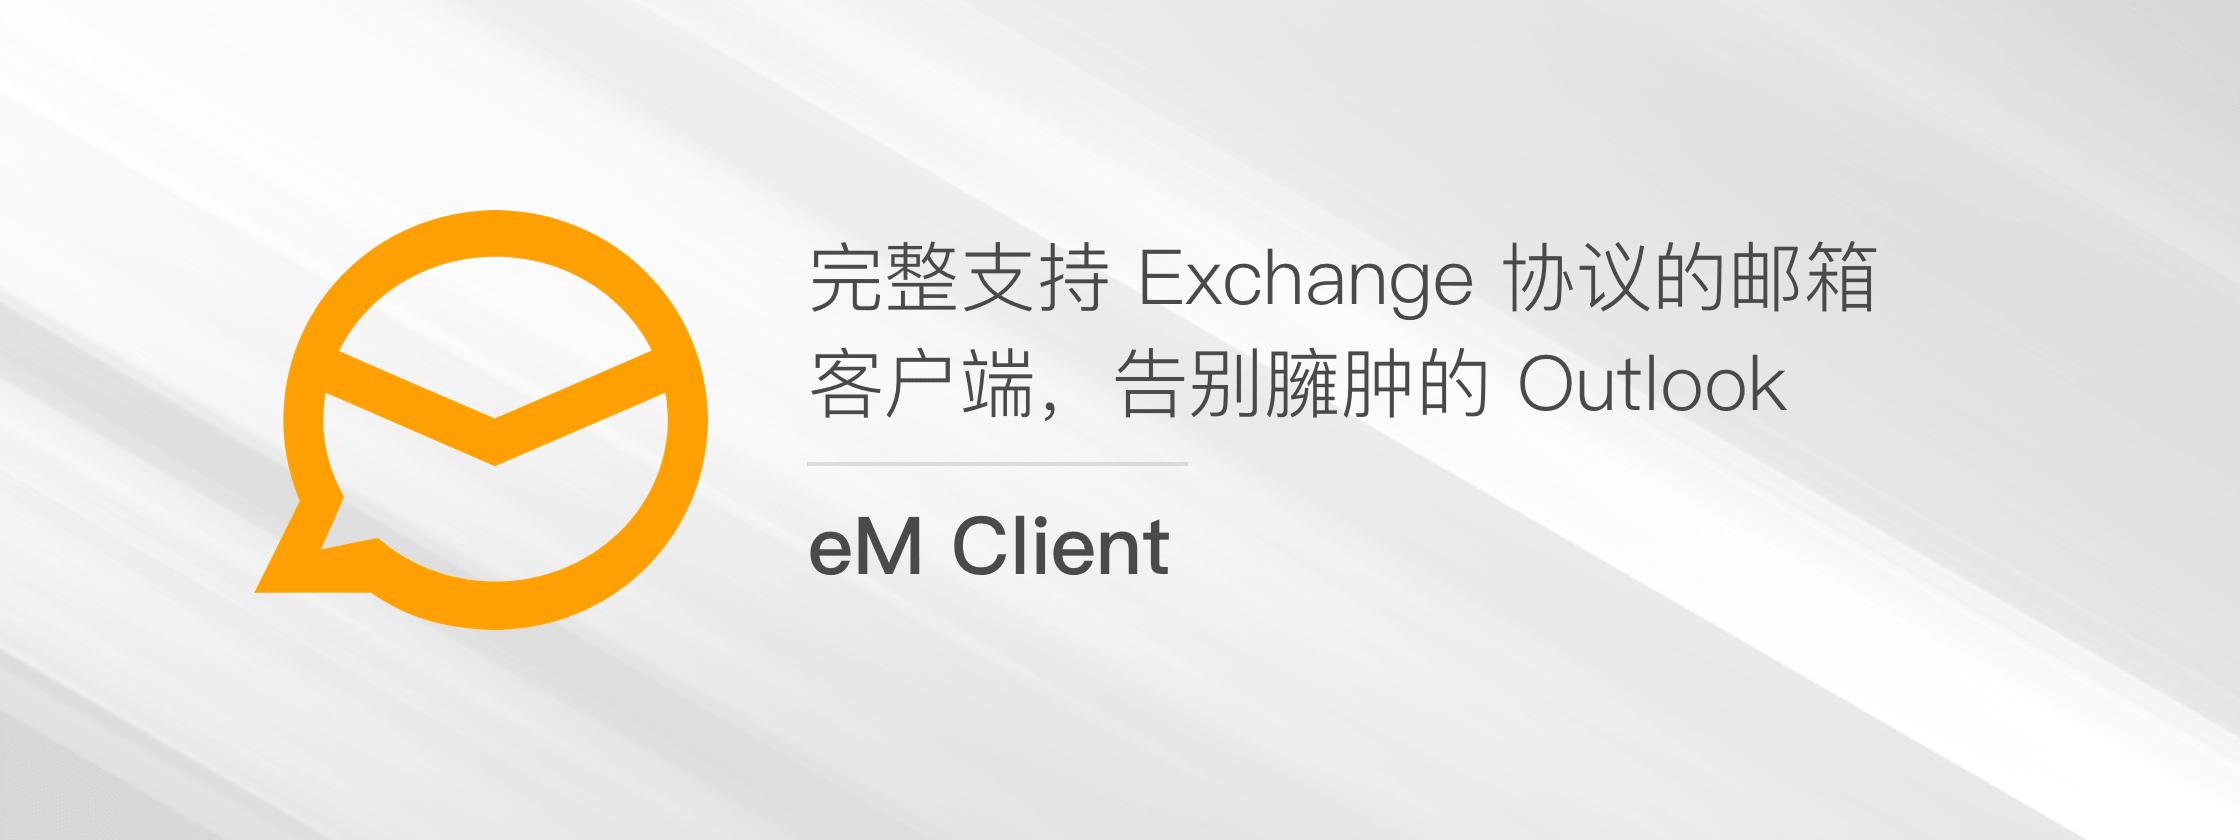 eM Client – 完整支持 Exchange 协议的邮箱客户端,告别臃肿的 Outlook